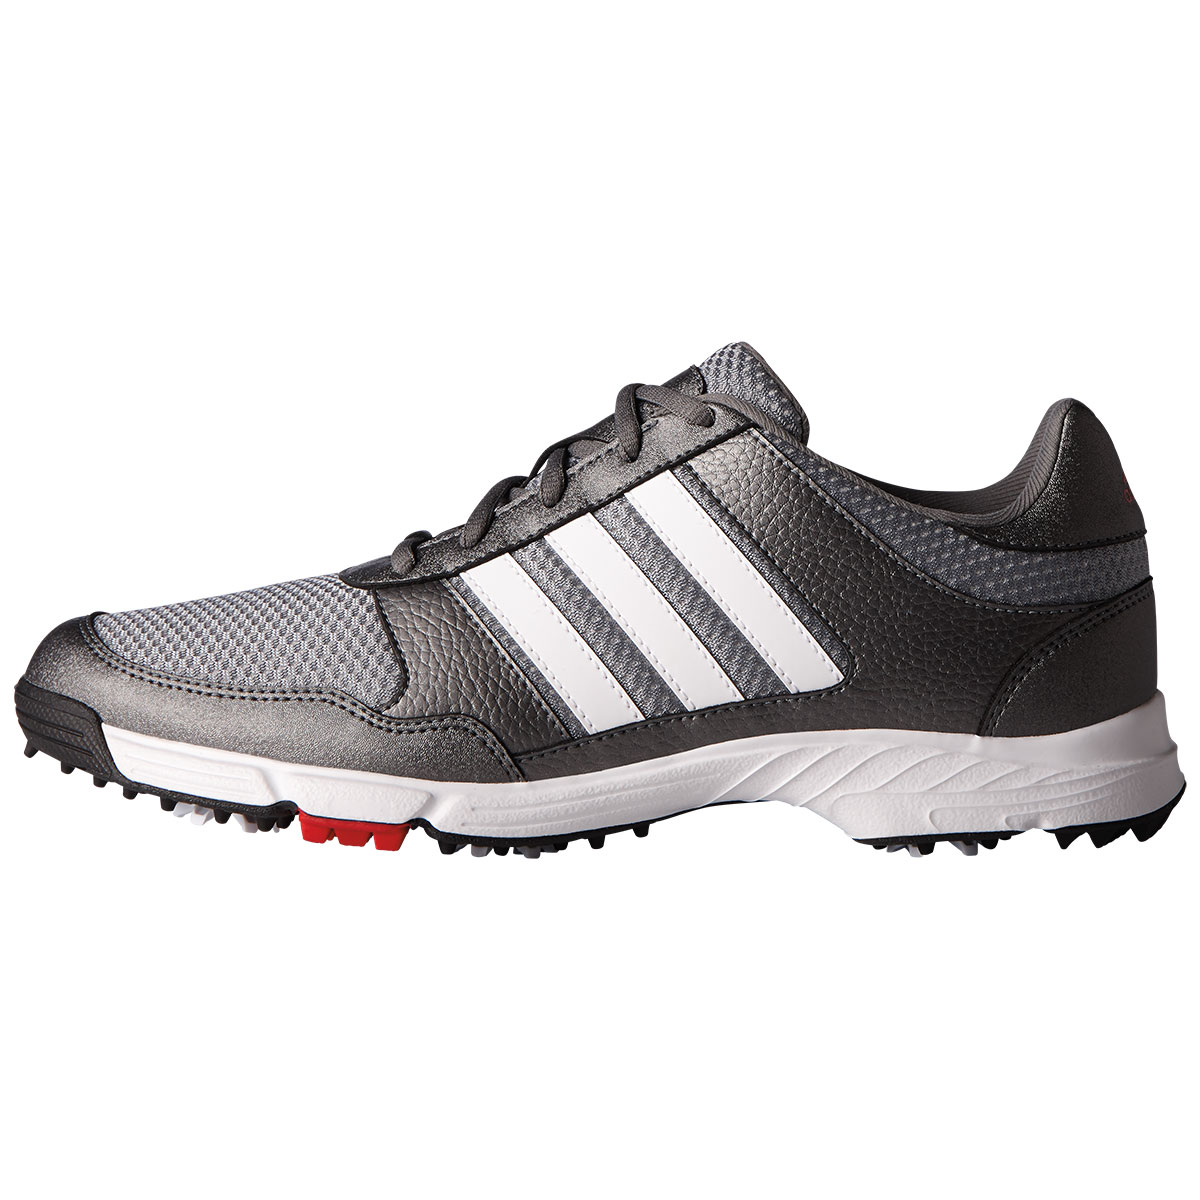 Adidas Men's 2019 Tech Response Grey Golf Shoe